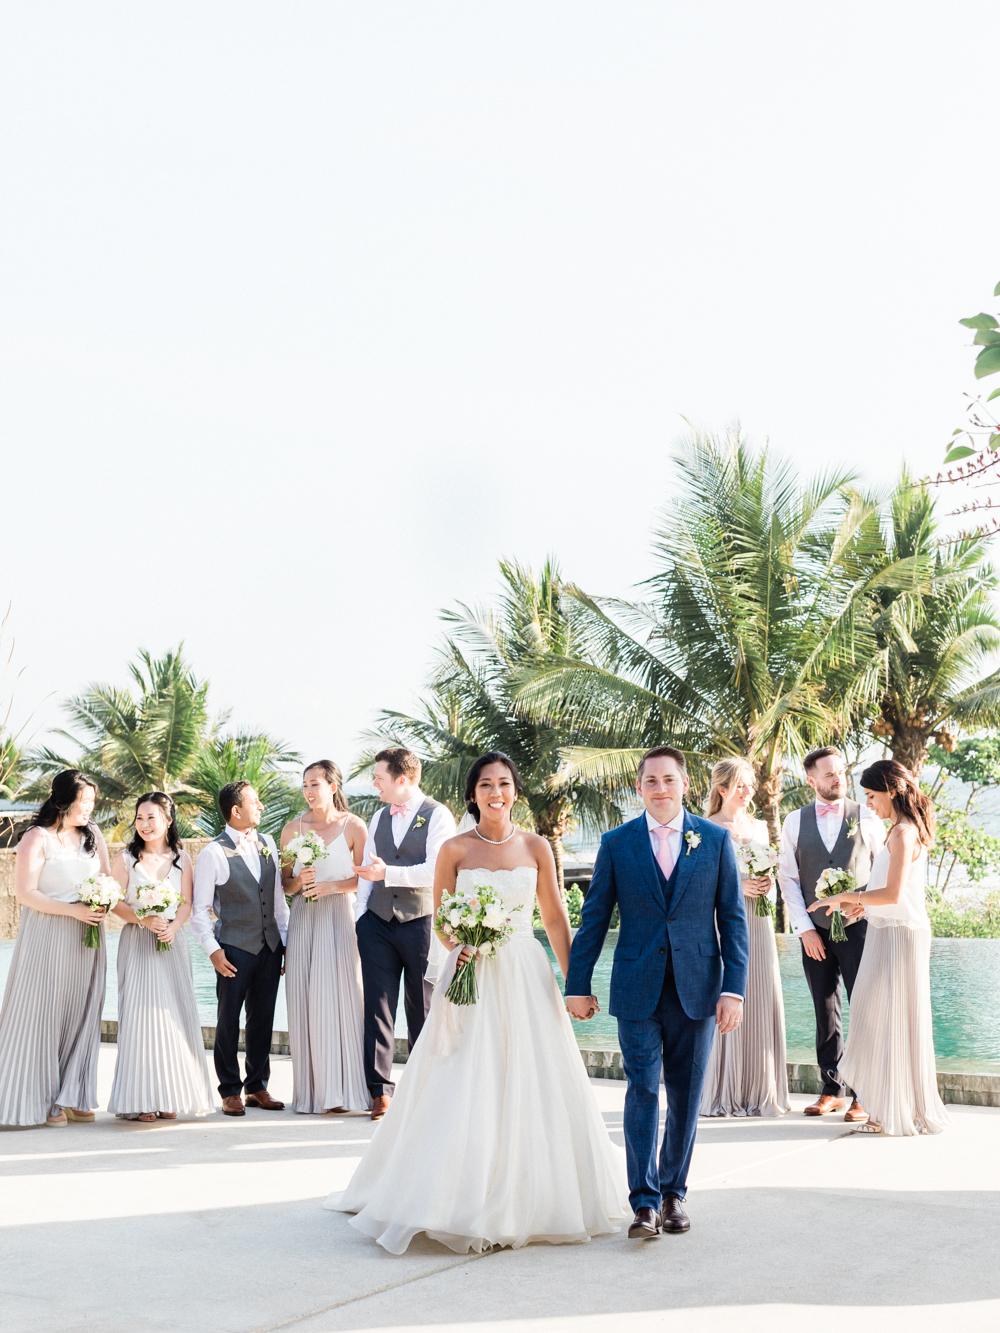 Bali_Real_Wedding_(c)_Rory_Wylie-73.jpg